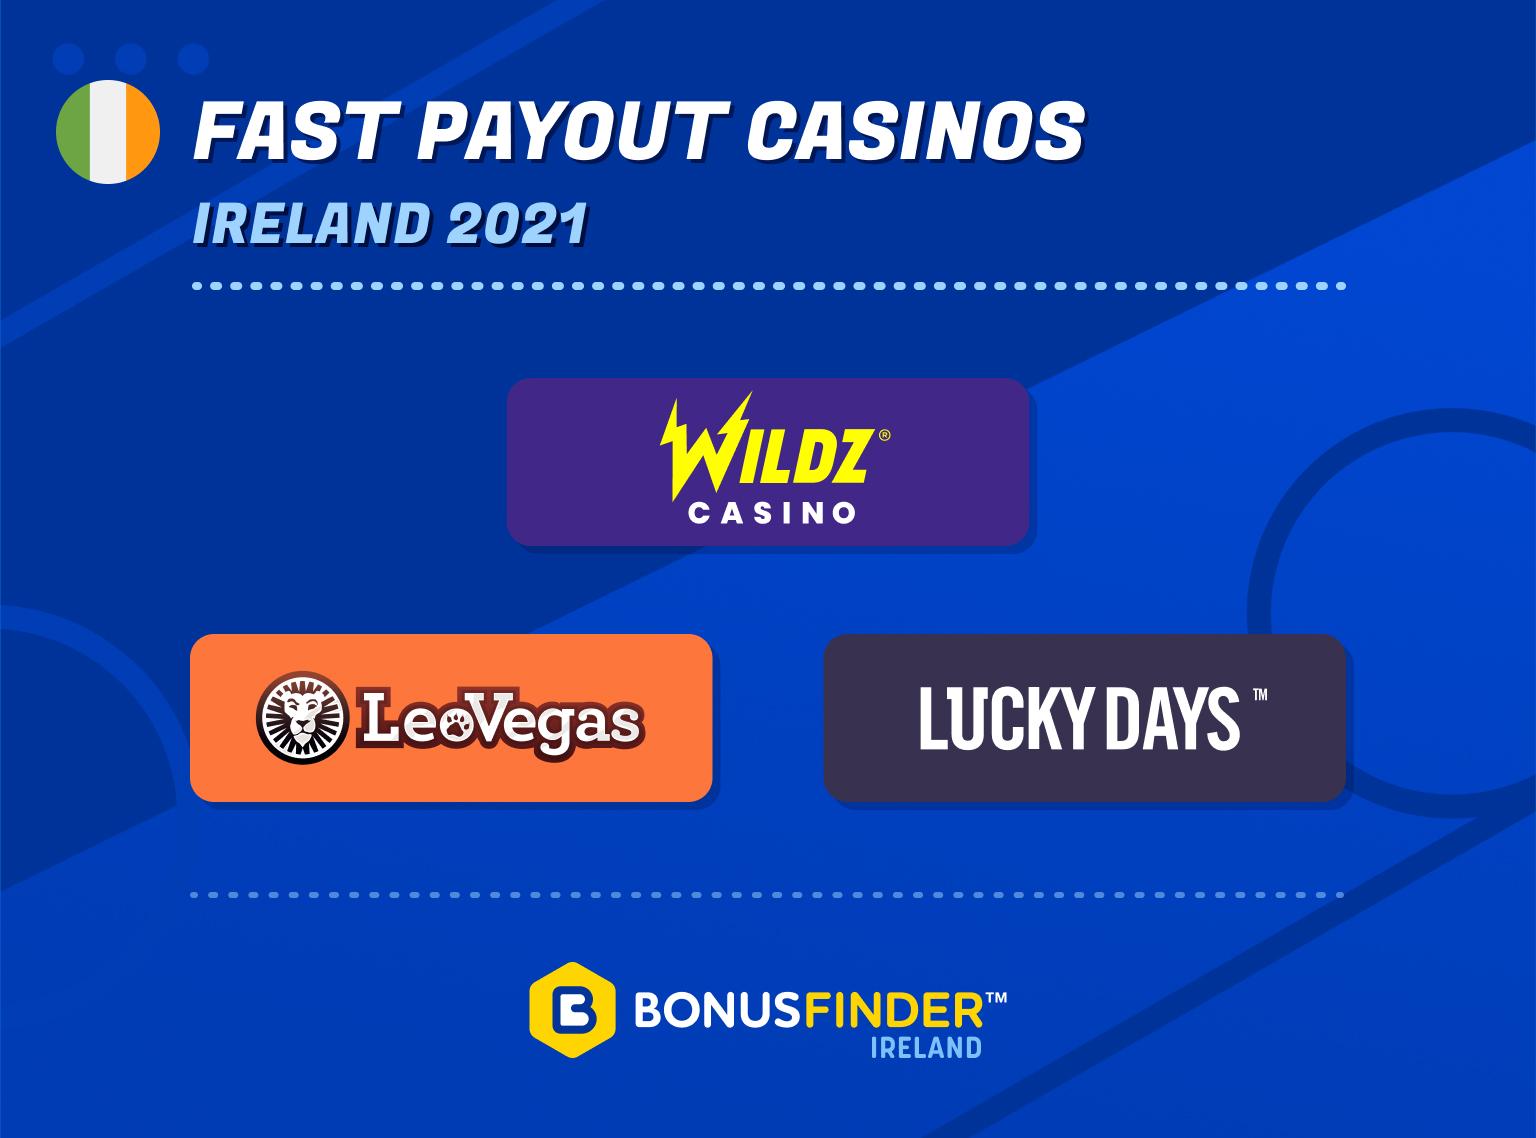 fast payout casinos ireland